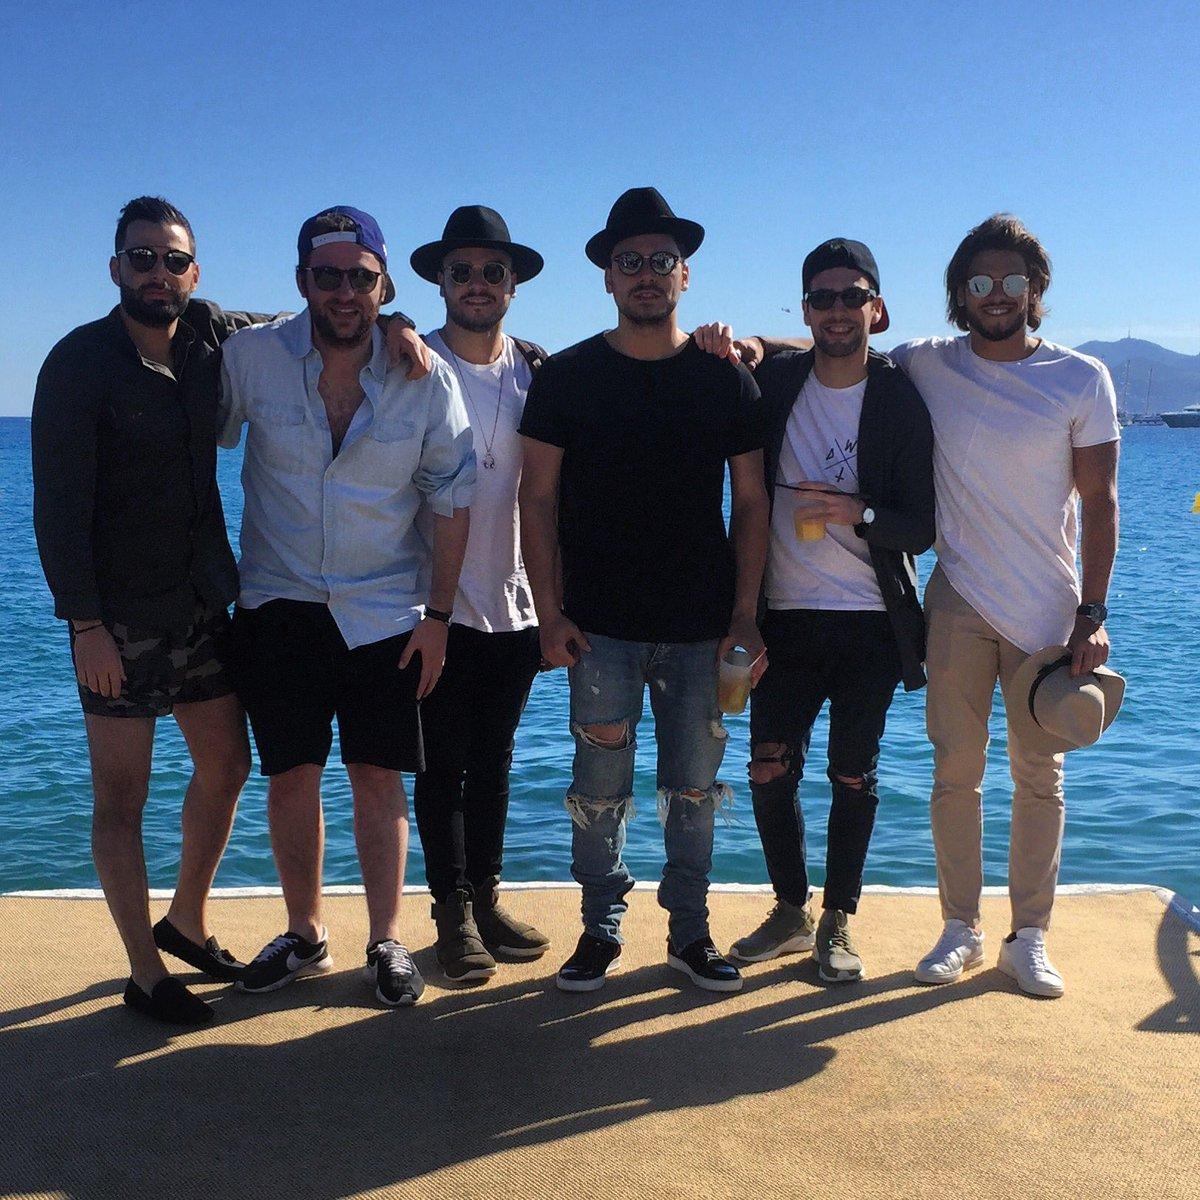 Cannes with Friends #DREAM #LesAnneesPassentLesAmisResent #Love #Crew #Entourage ️️<br>http://pic.twitter.com/Y6gjSQleqp